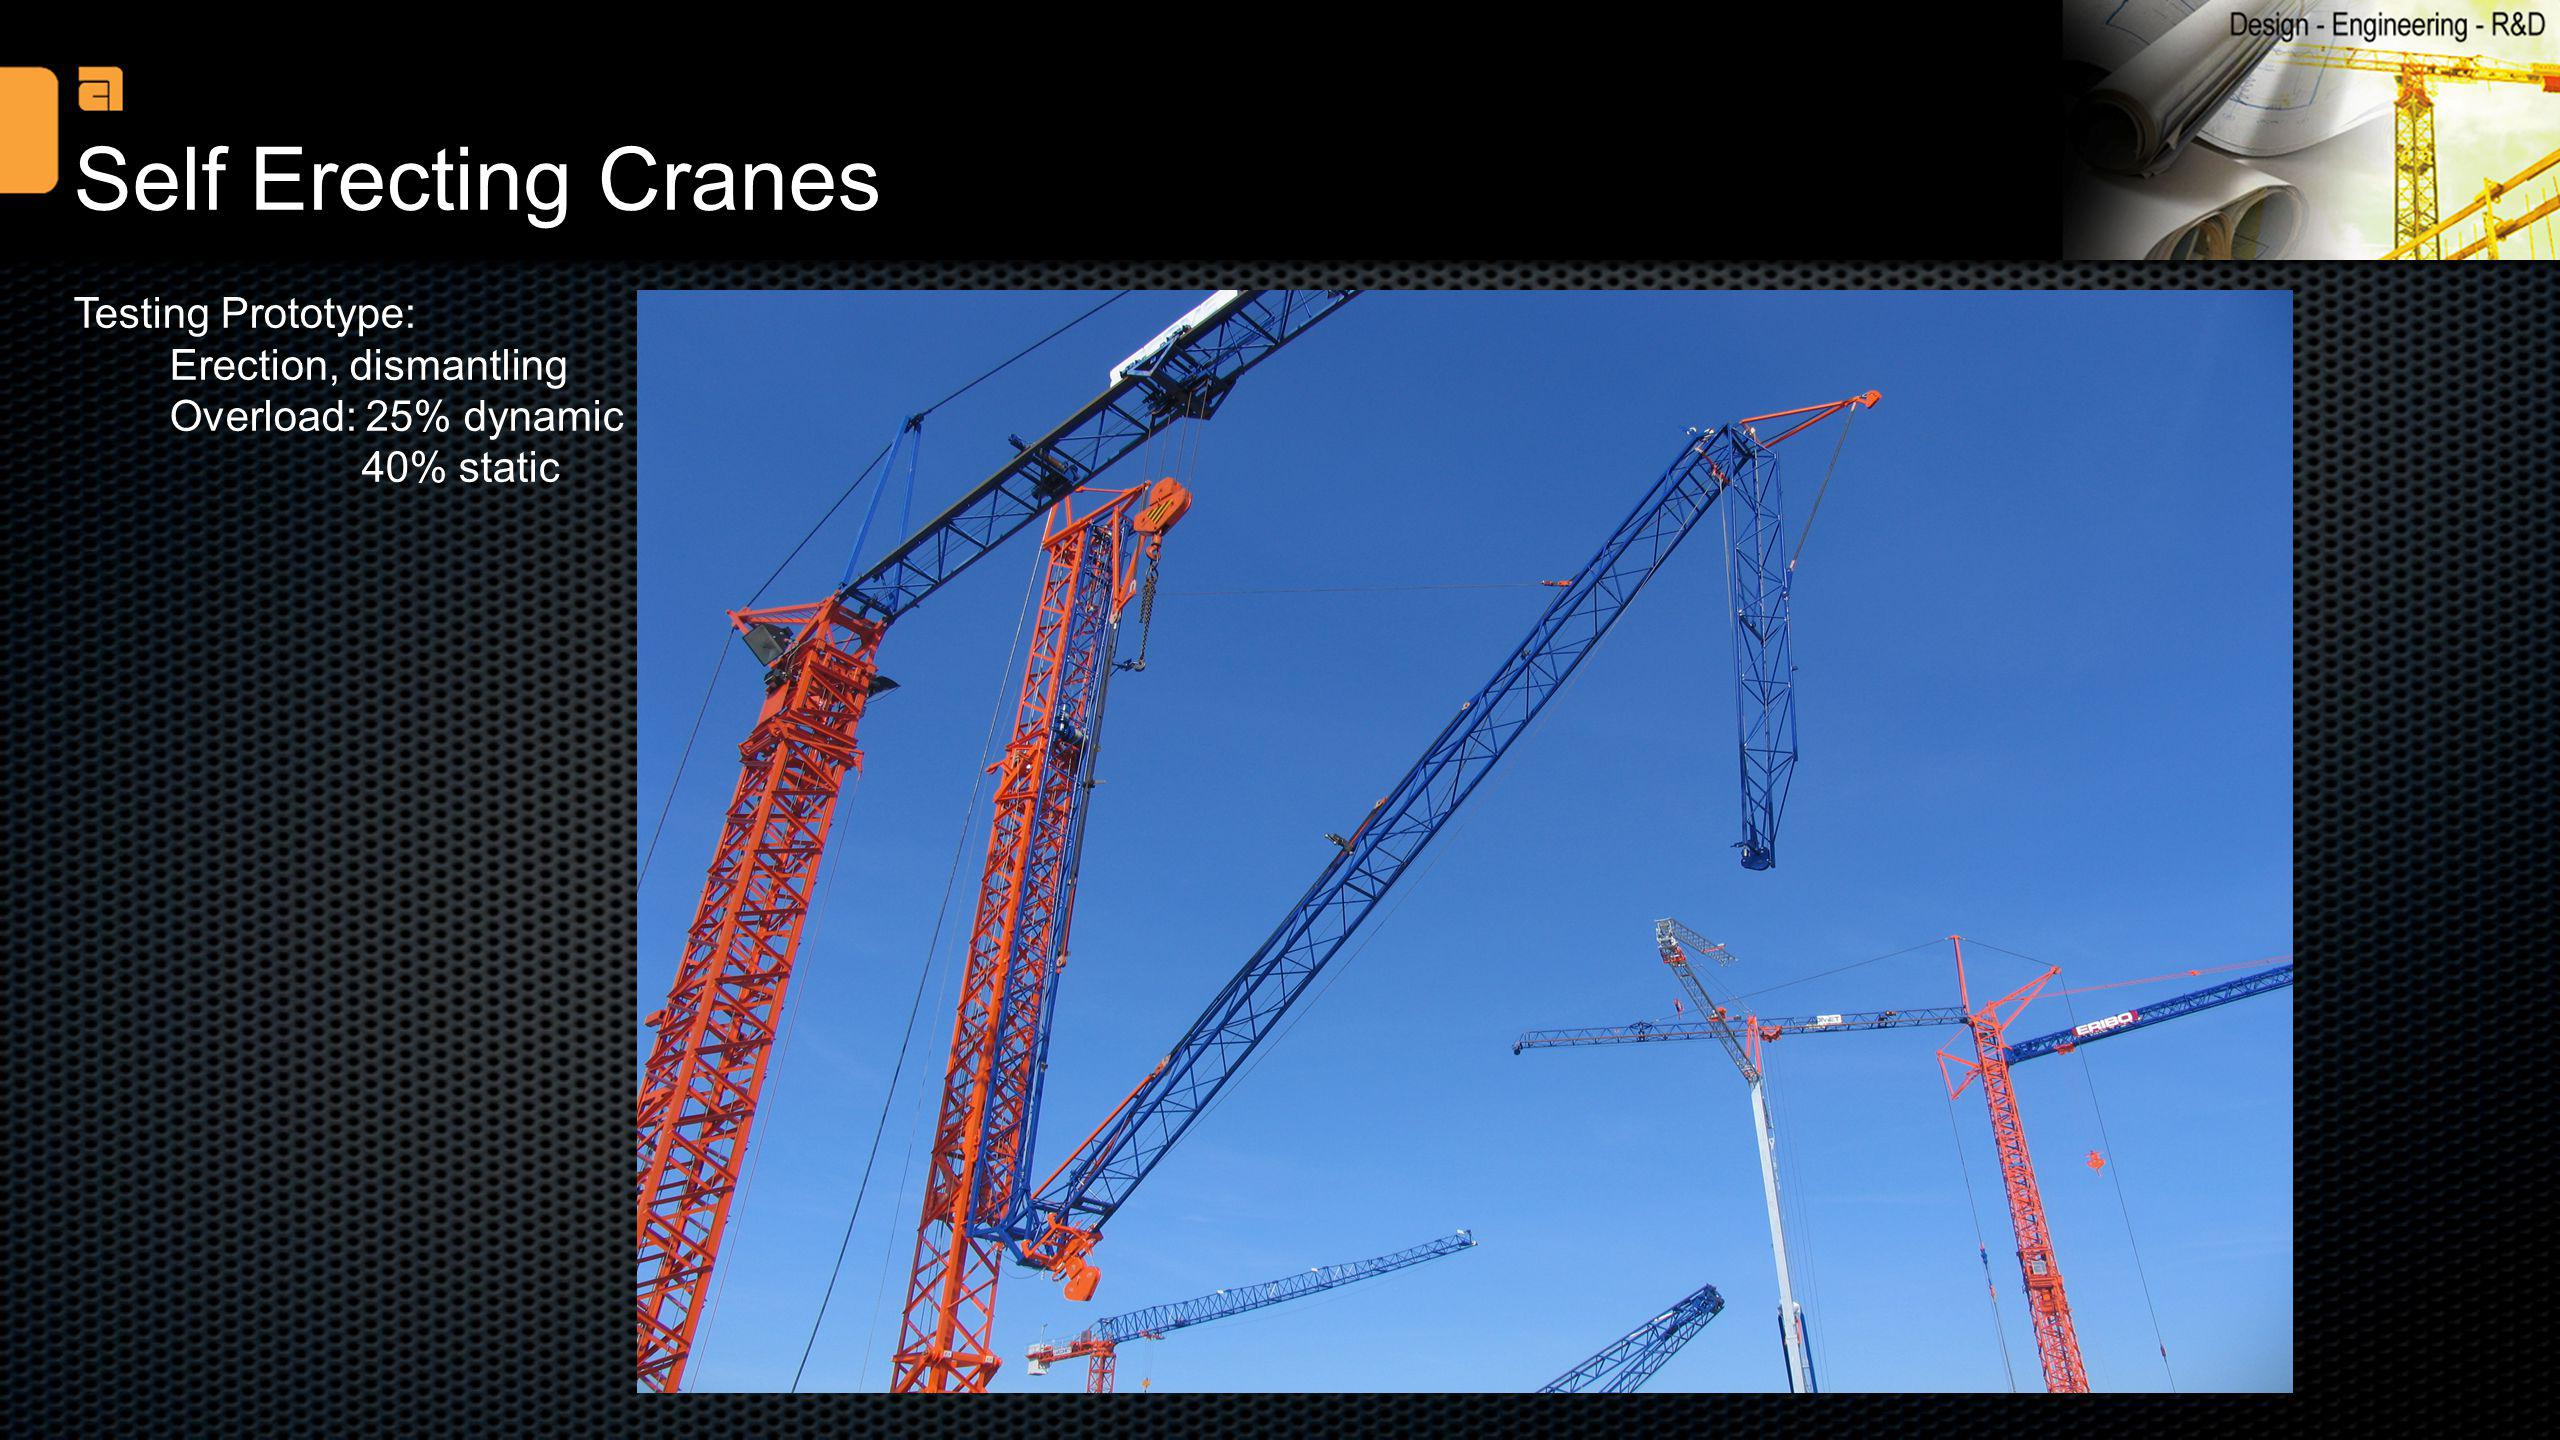 Self Erecting Cranes Testing Prototype: Erection, dismantling